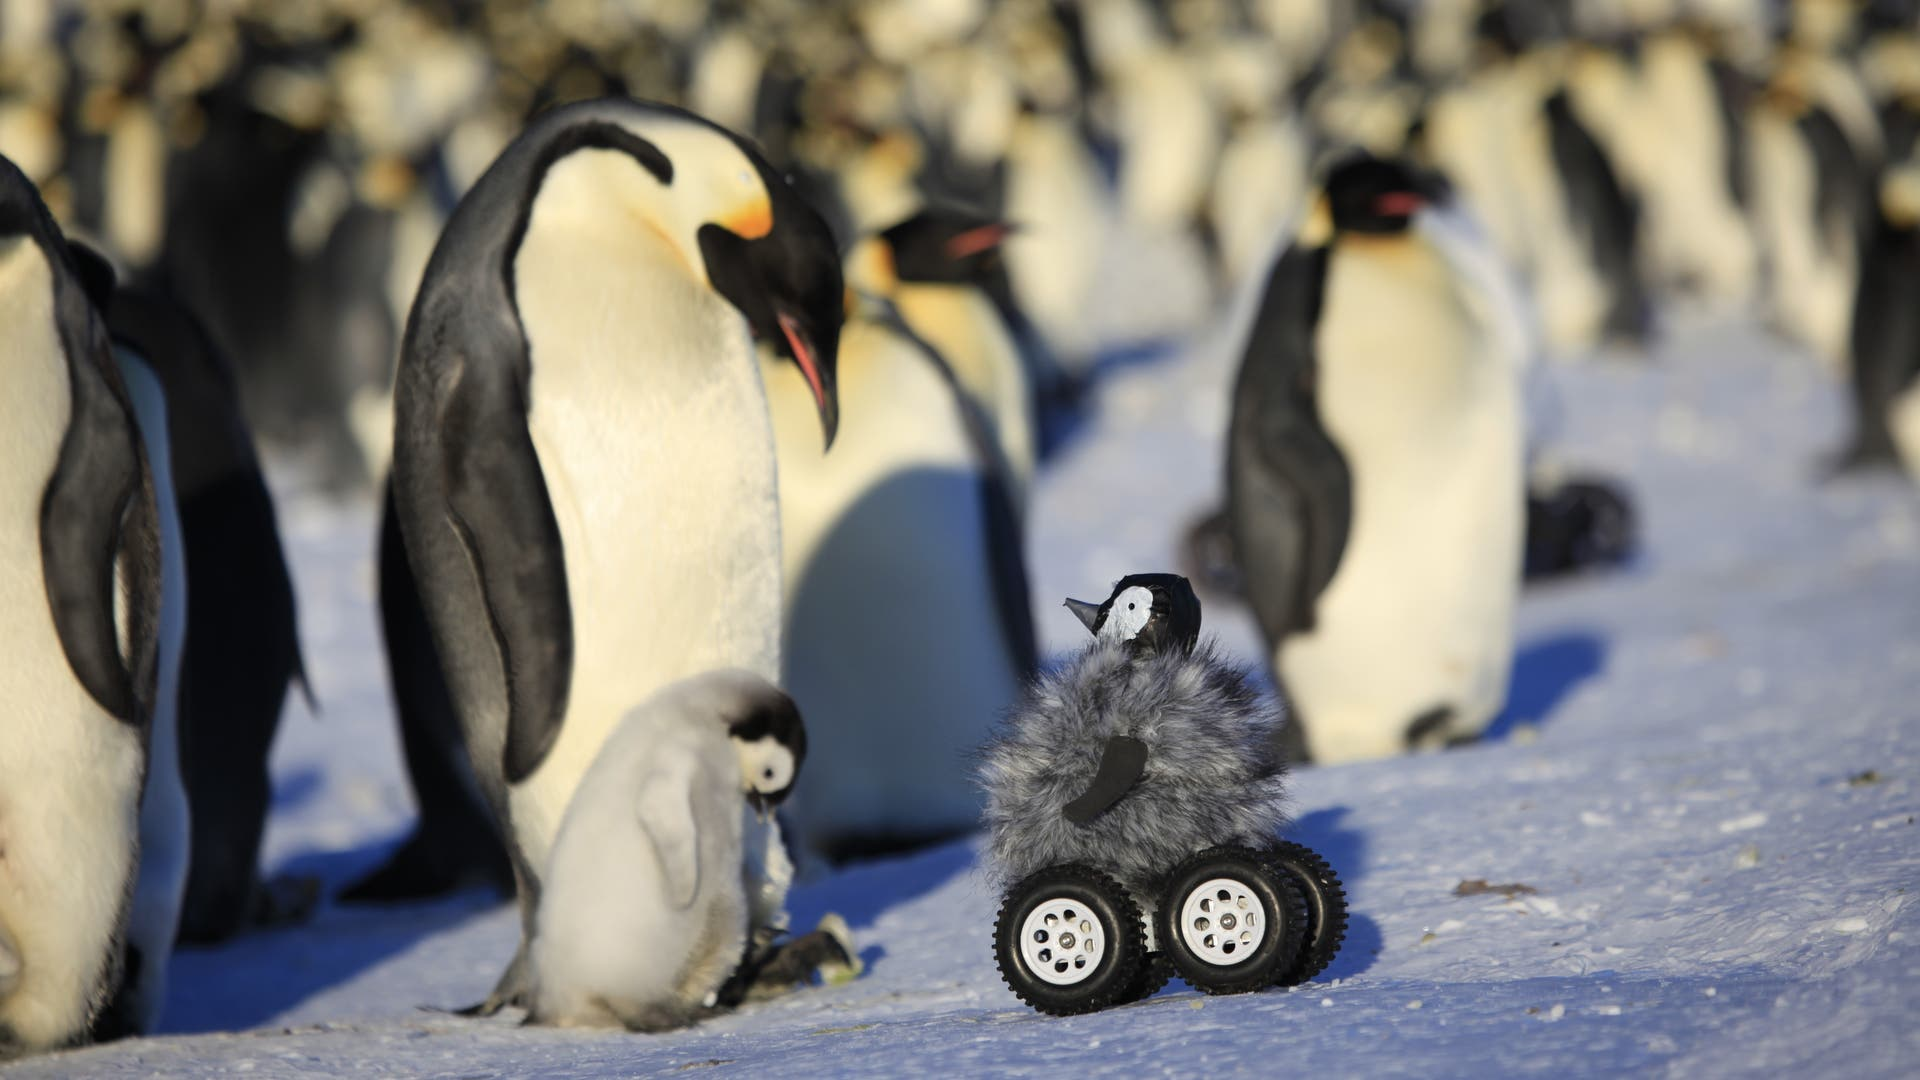 Perfekt getarnter Pinguinroboter